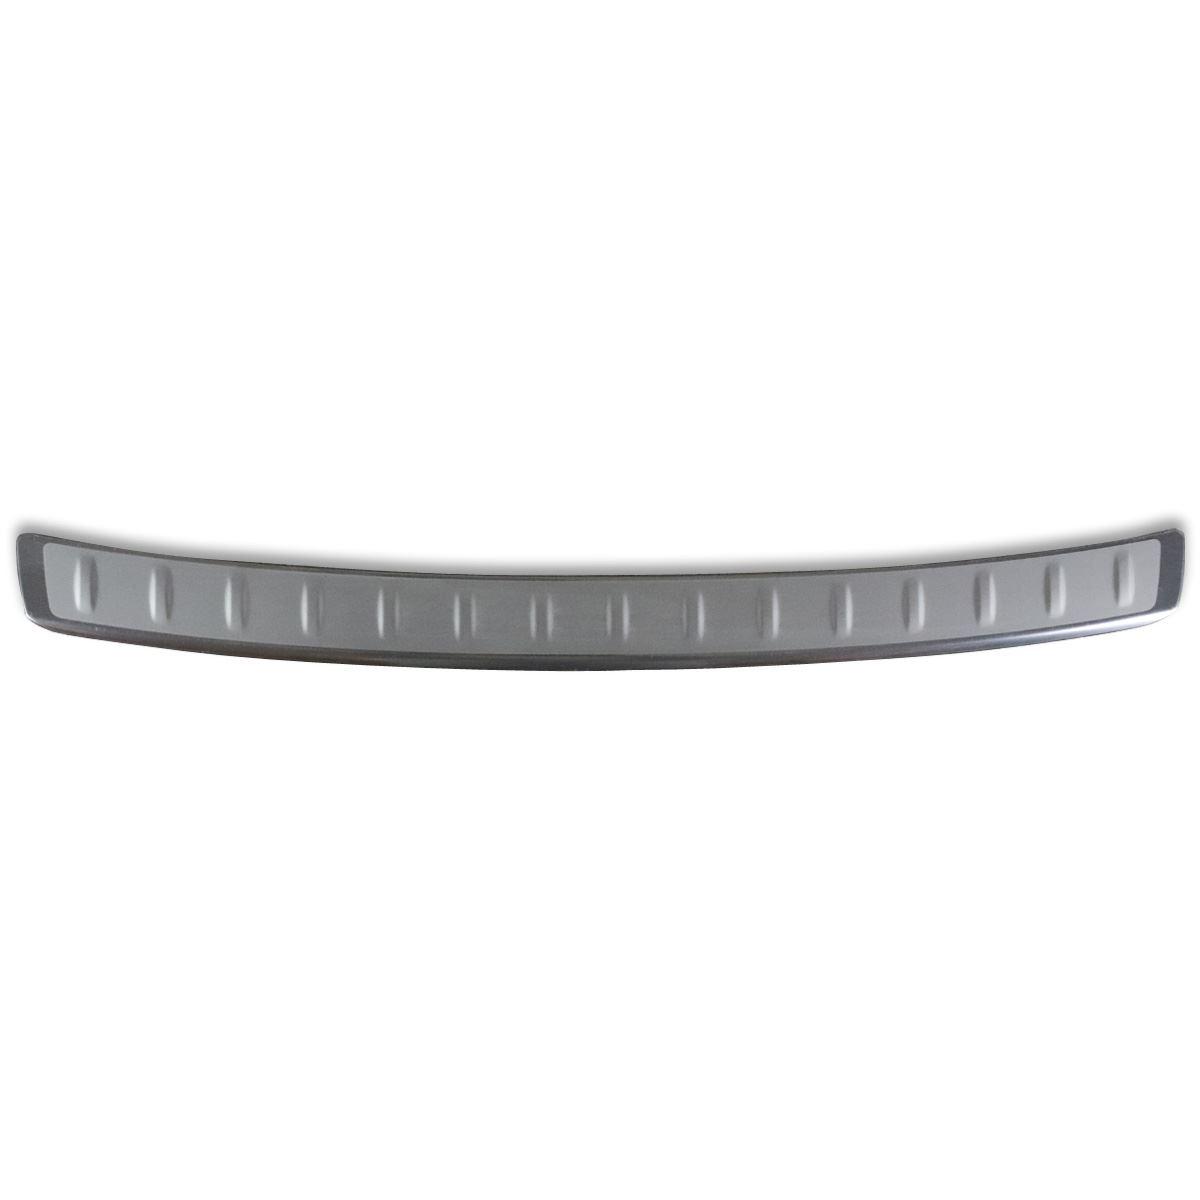 Genuine Ford Fiesta MK8 Rear Bumper Protector plate contoured ST//ST 2325995